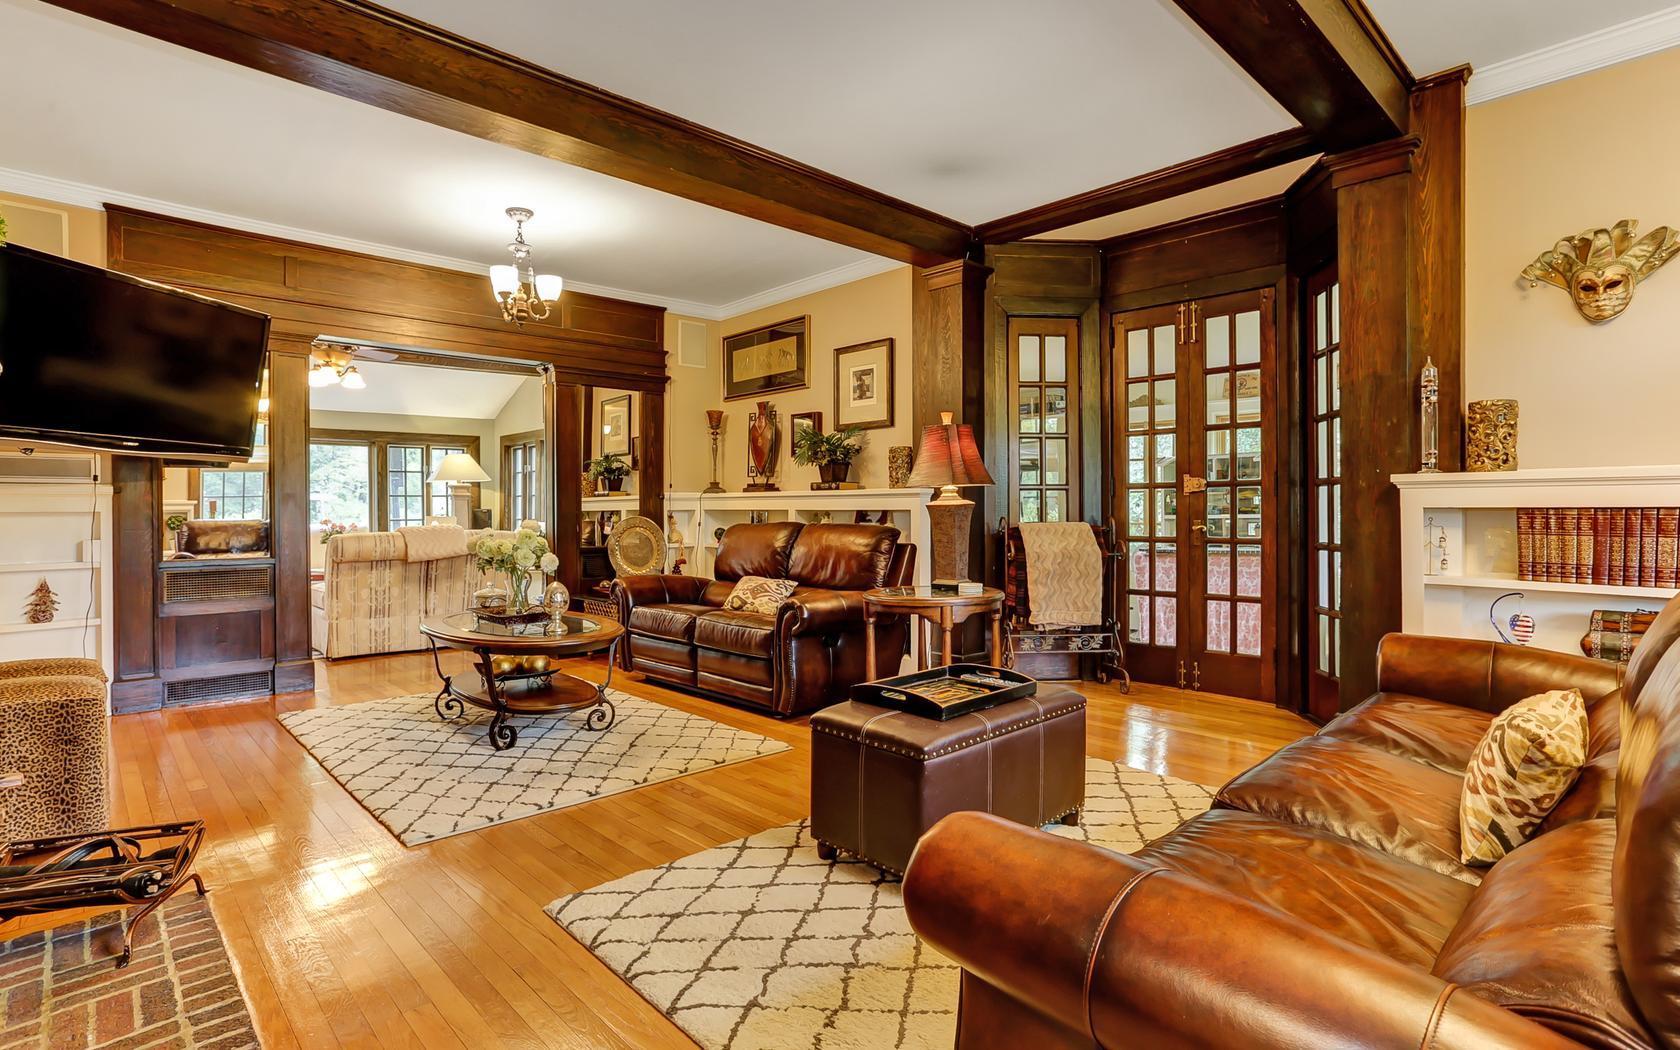 6 Bedroom English Tudor Colonial in Mountainside, NJ